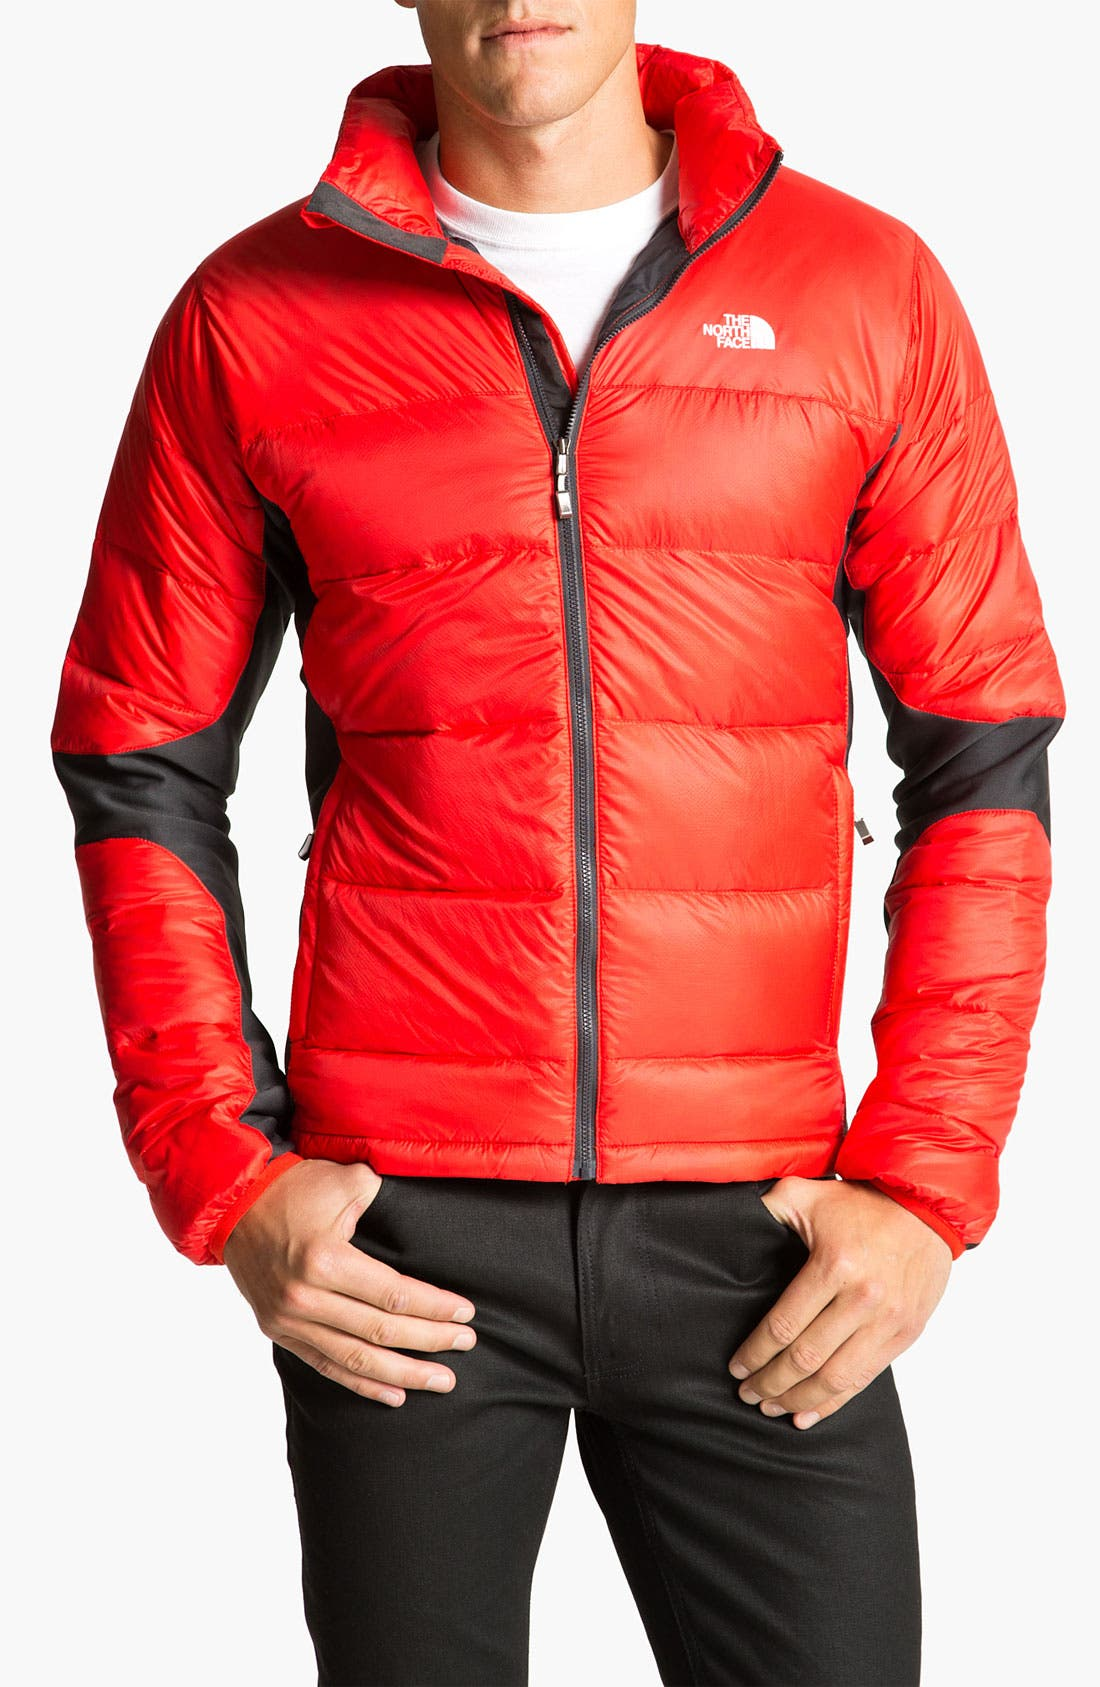 Alternate Image 1 Selected - The North Face 'Crimptastic' Hybrid Down Jacket